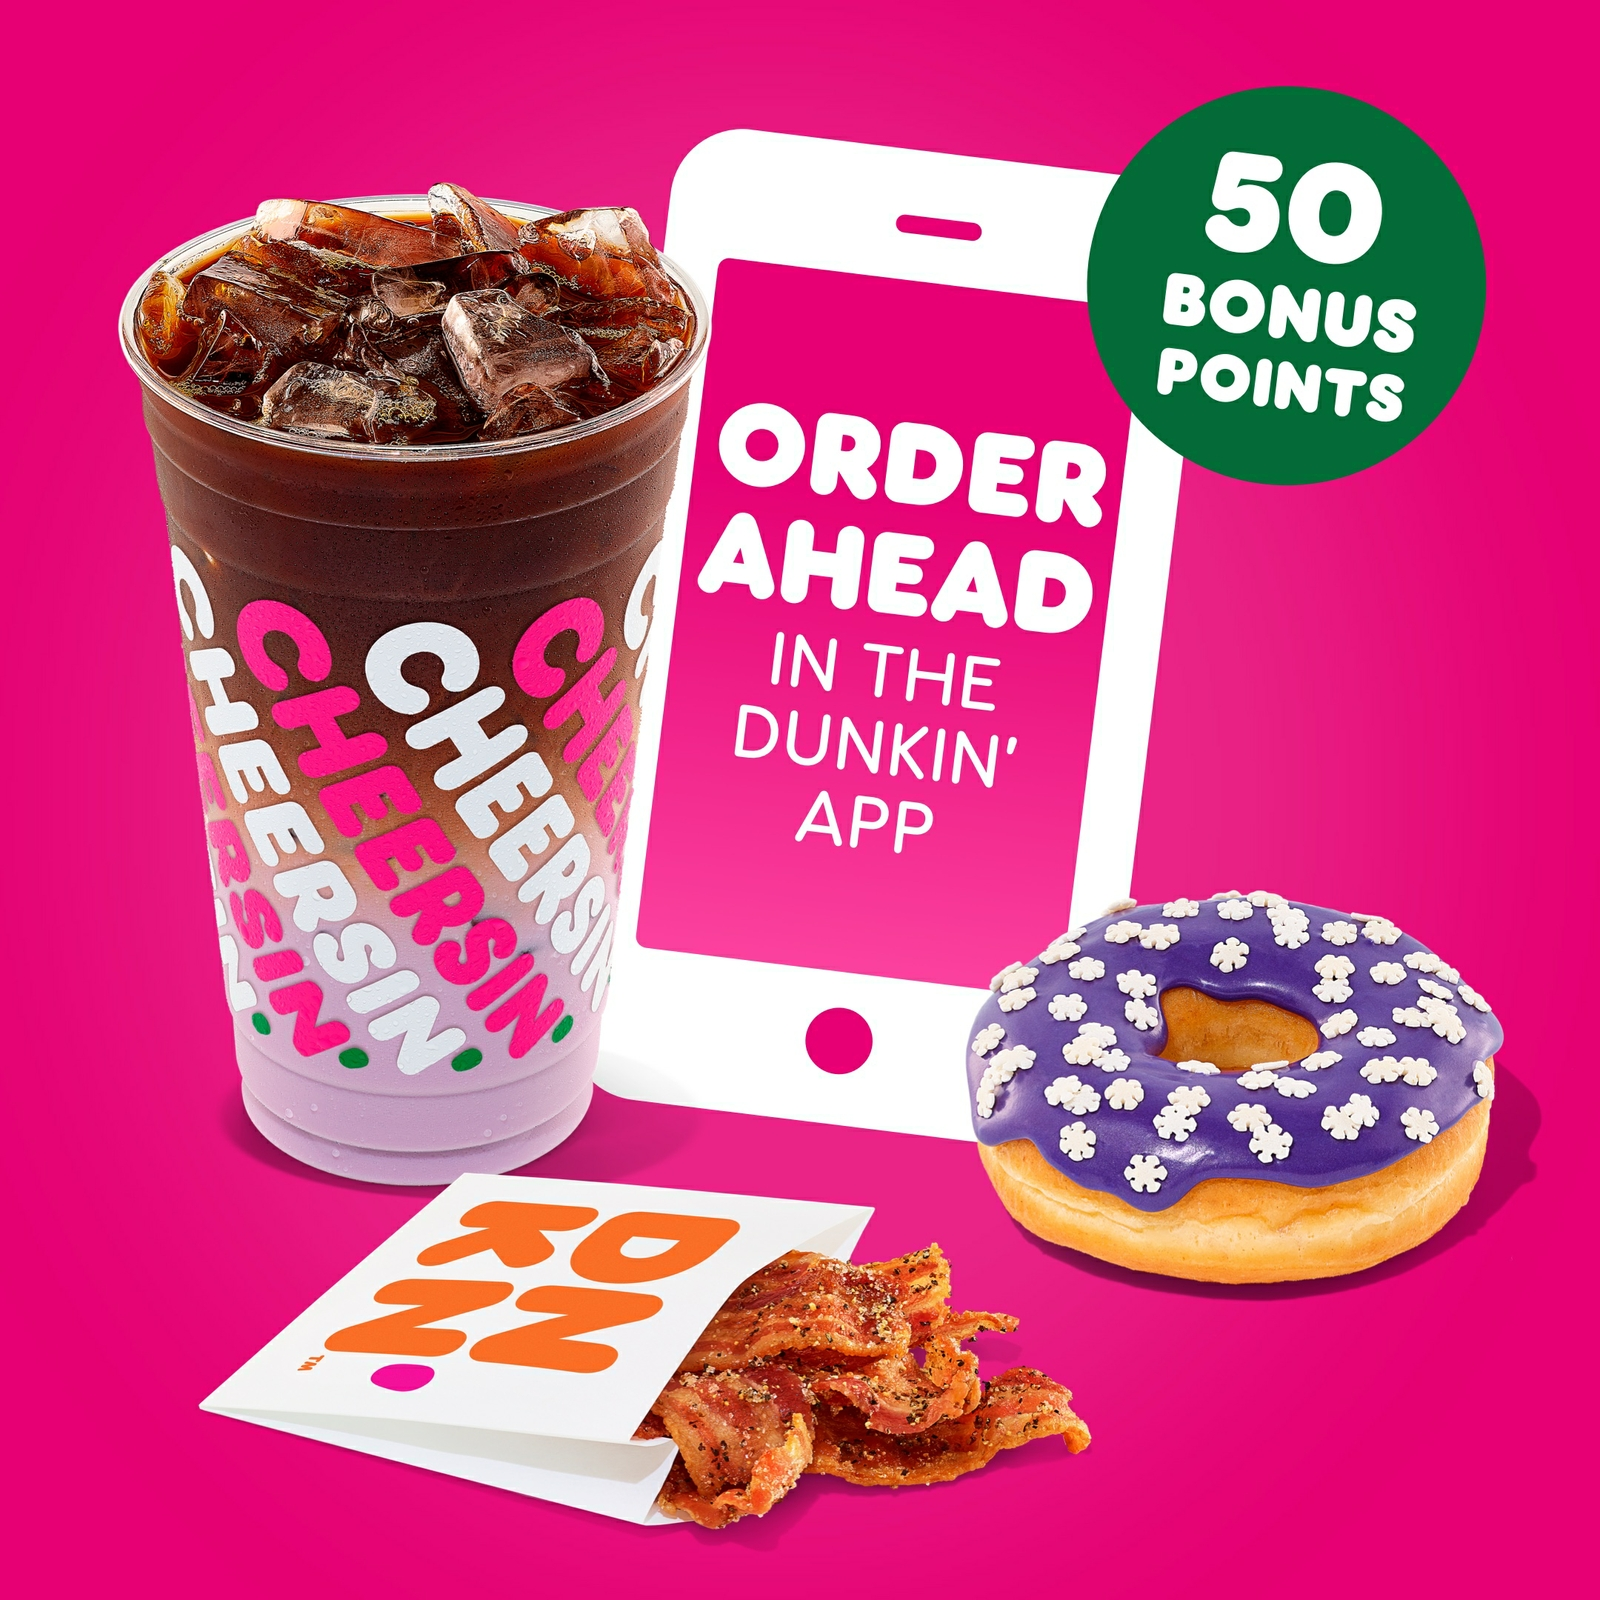 Unwrap 50 Bonus Points When You Order Ahead on the Dunkin' App